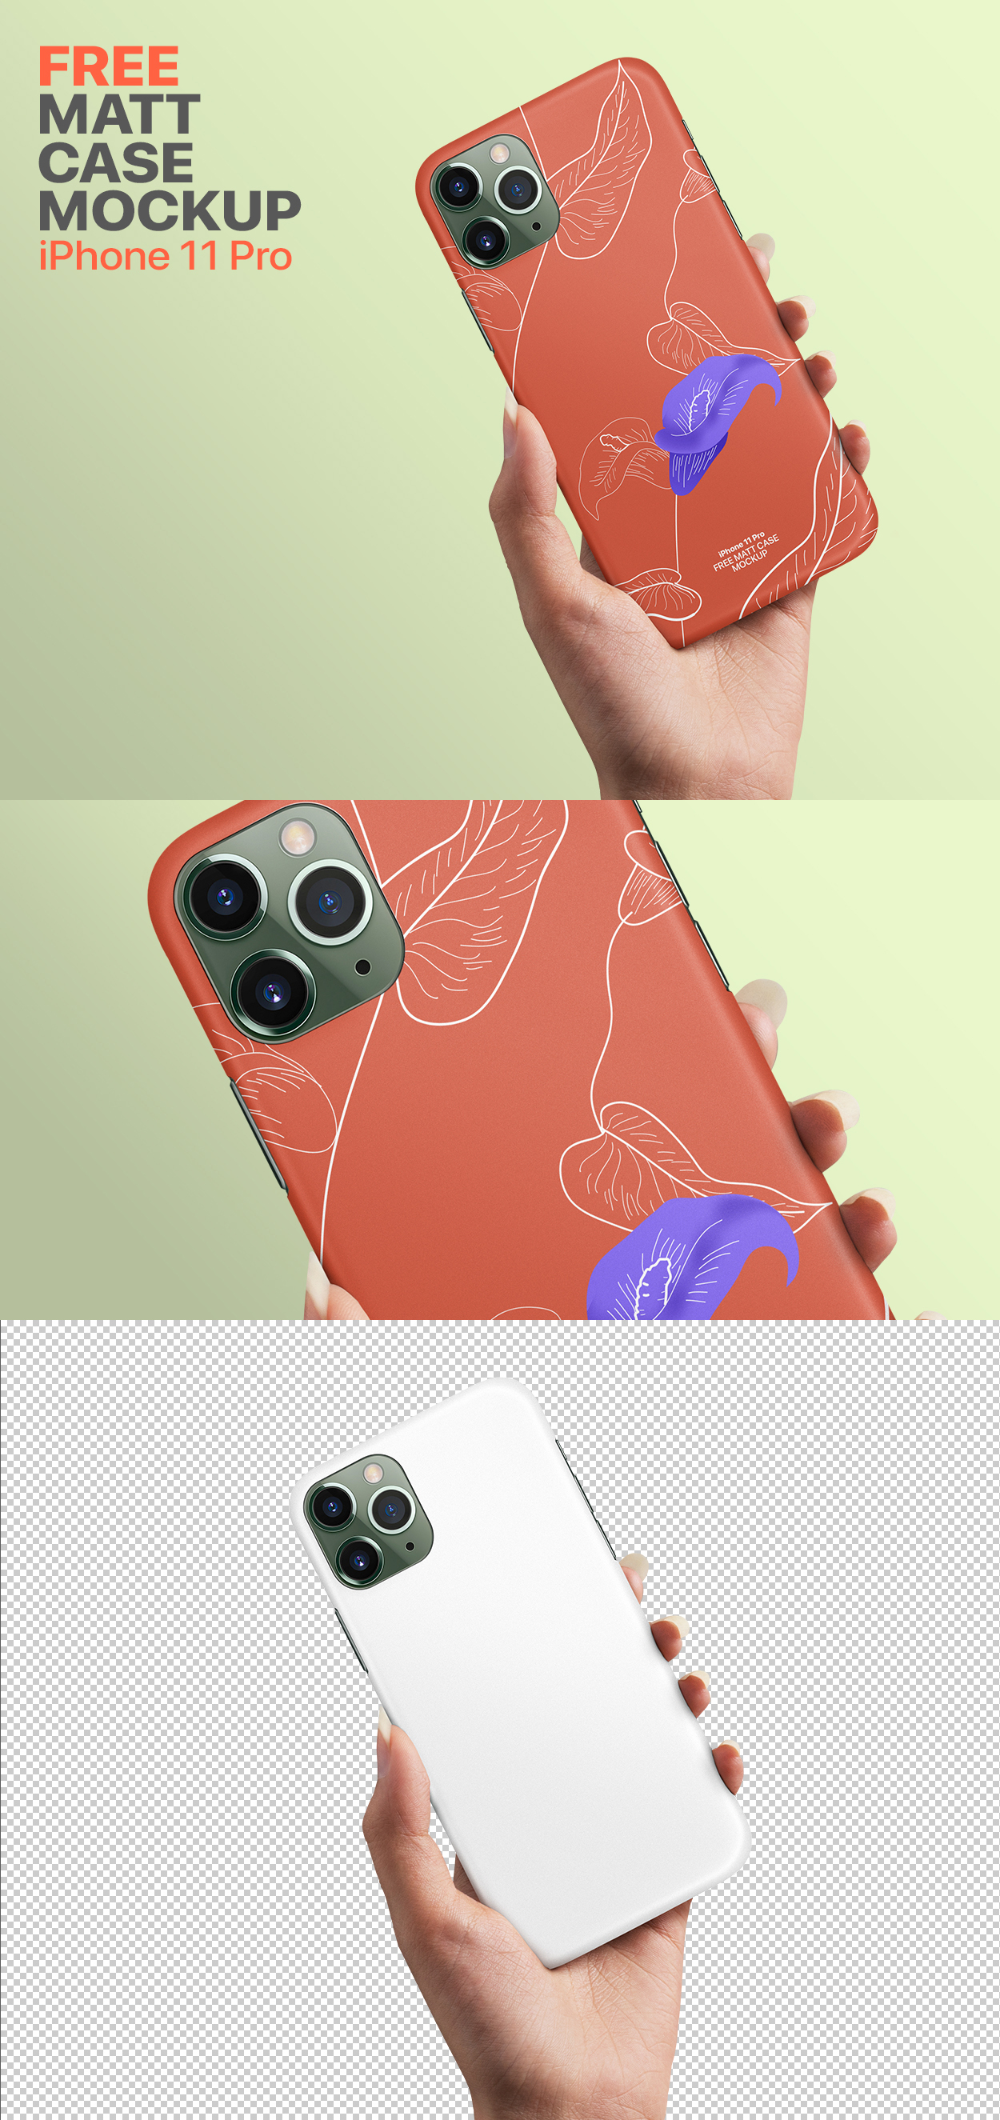 Download Free Iphone 11 Pro Case Mockup Free Design Resources Iphone Free Iphone Iphone Mockup Free